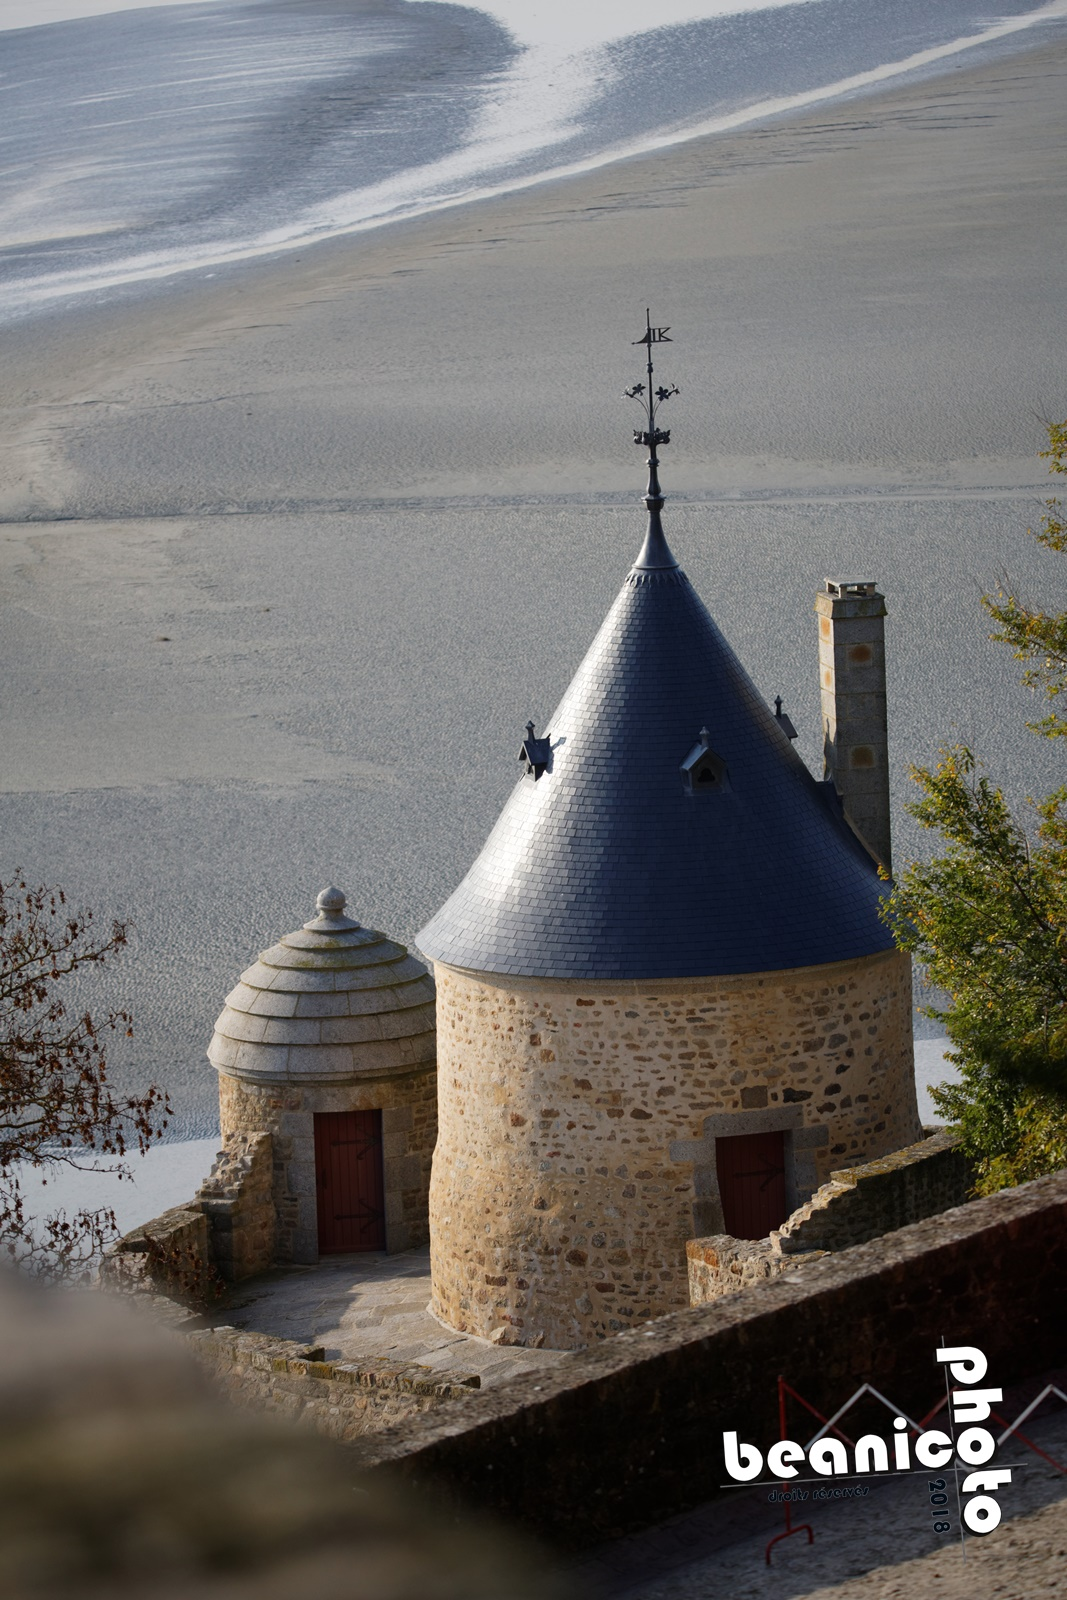 Canon 5DIII + Tamron 150-600 G2 - 180mm f/5.0 1/2000 ISO400 - Mont Saint Michel - beanico-photo